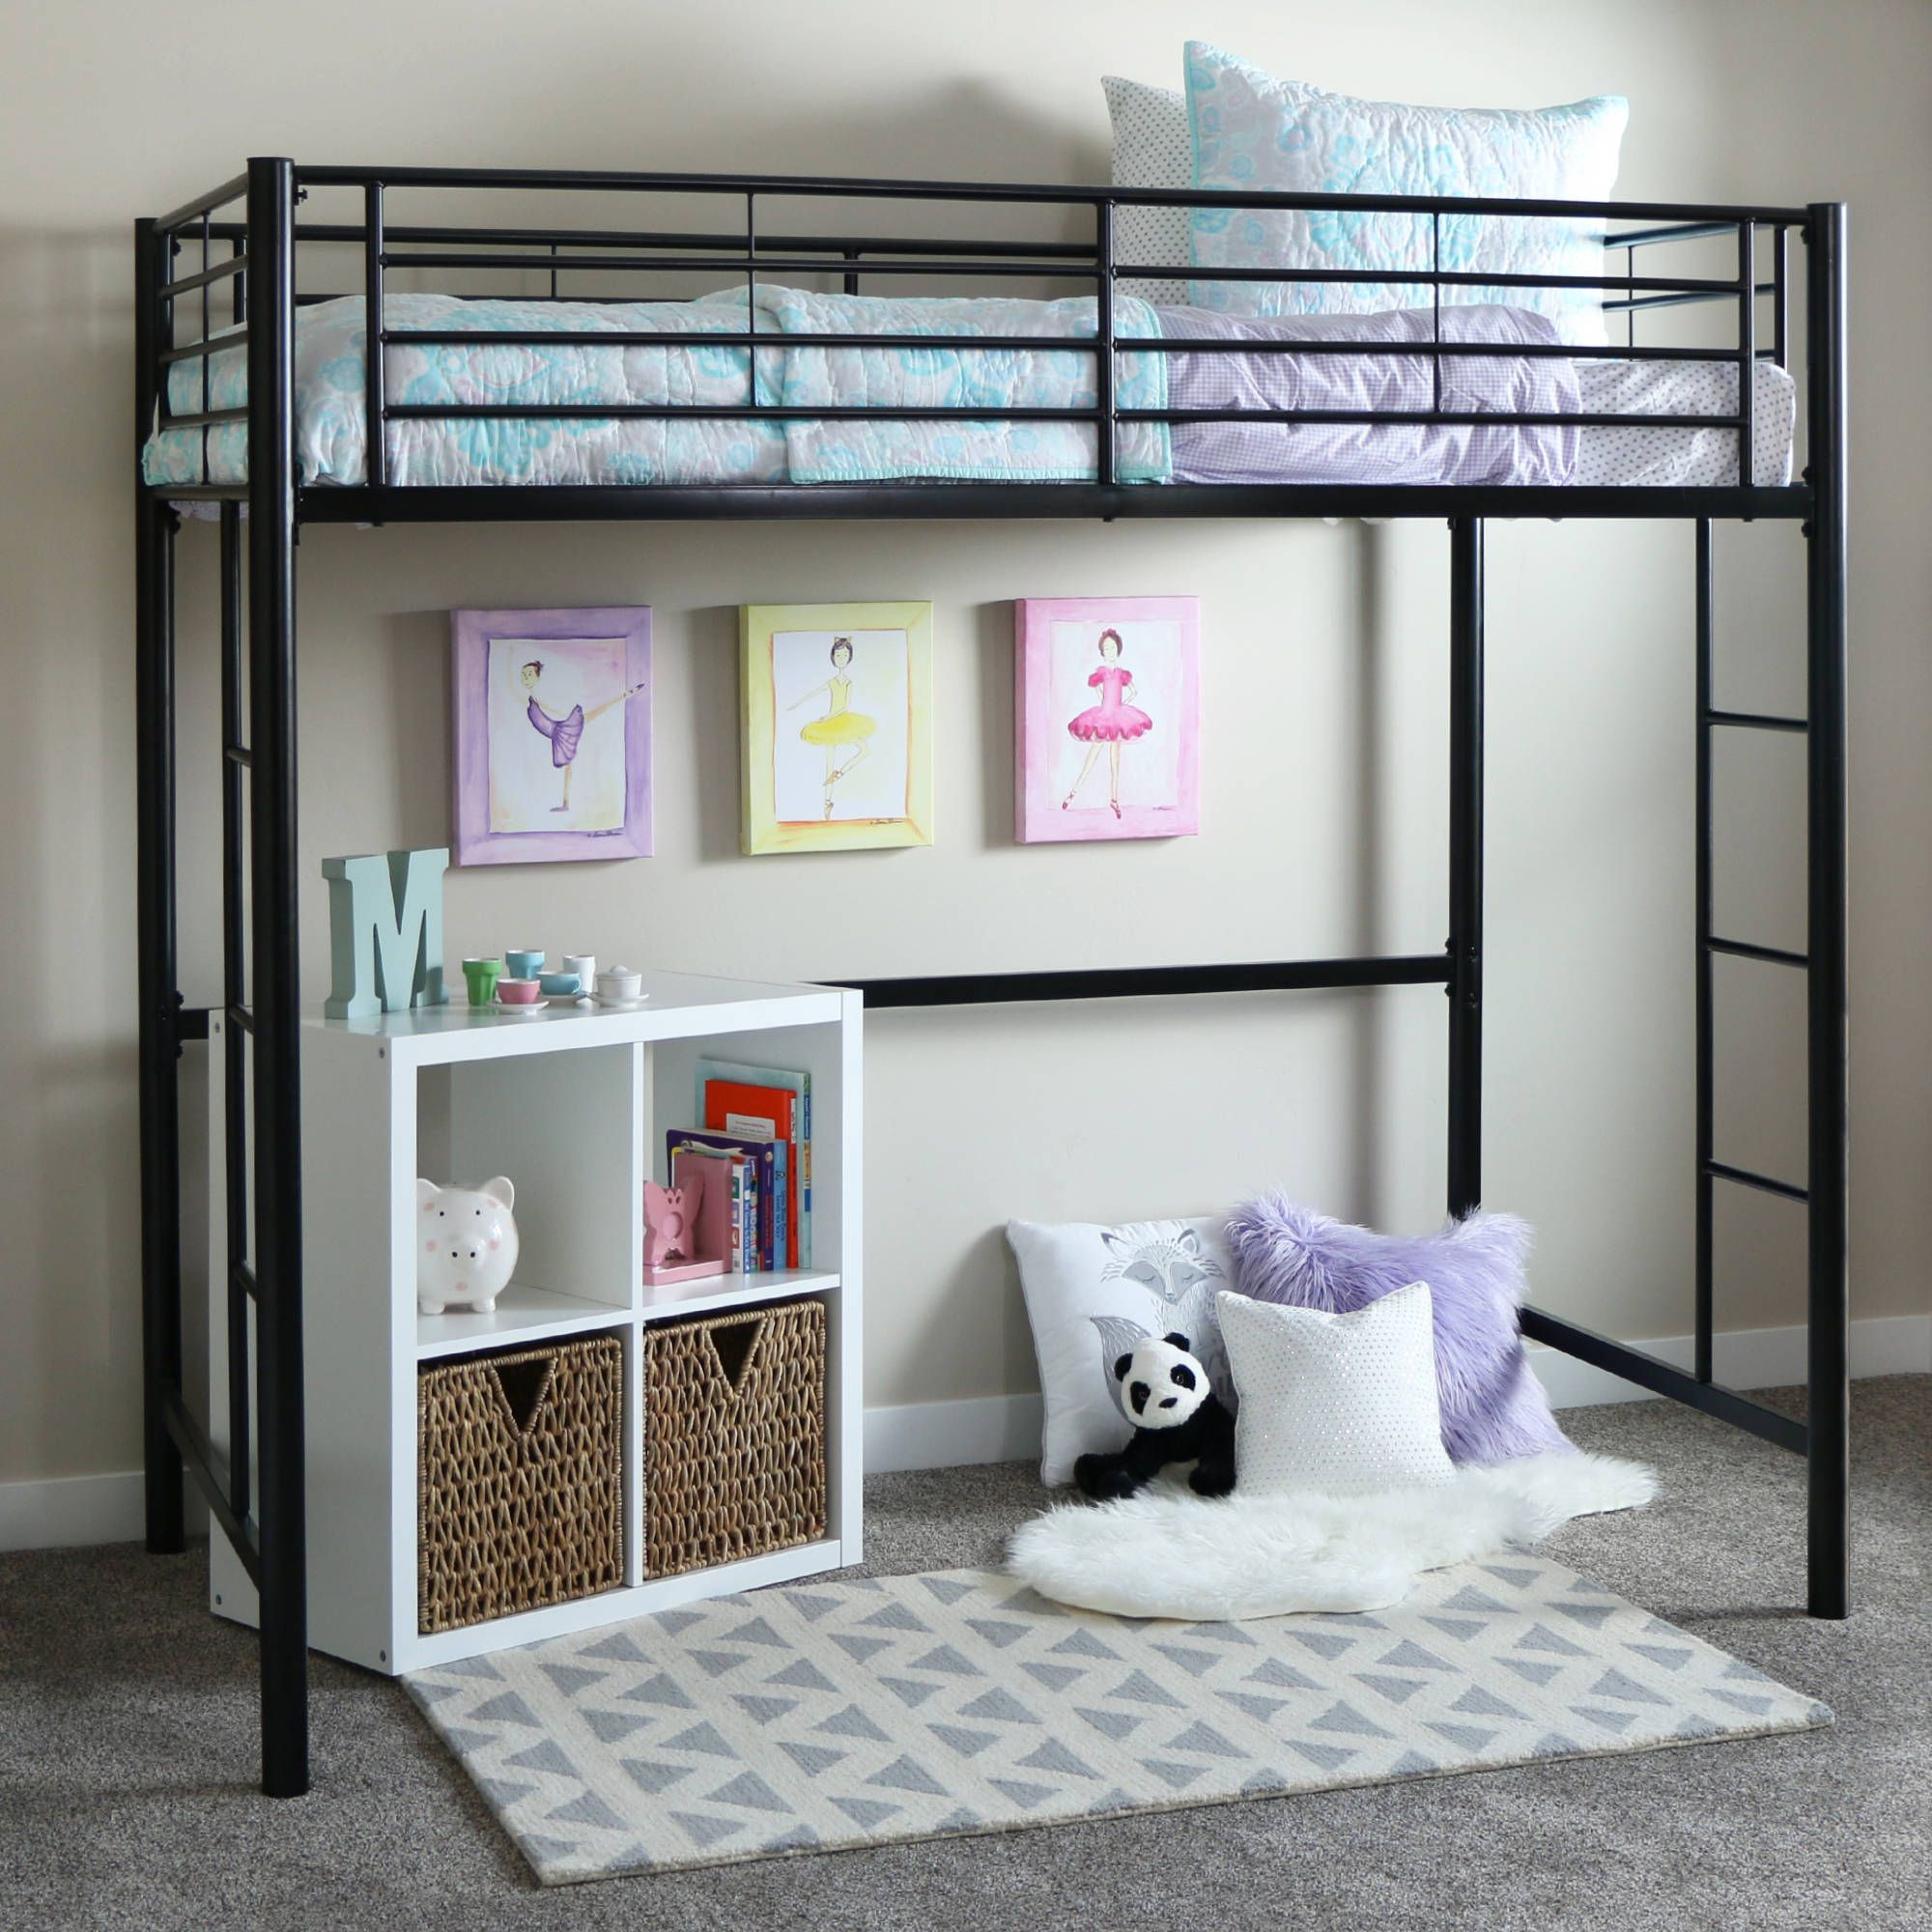 bed click over dorm thumbnail loft twin kids w to bunk itm furniture bedroom ladder metal enlarge full